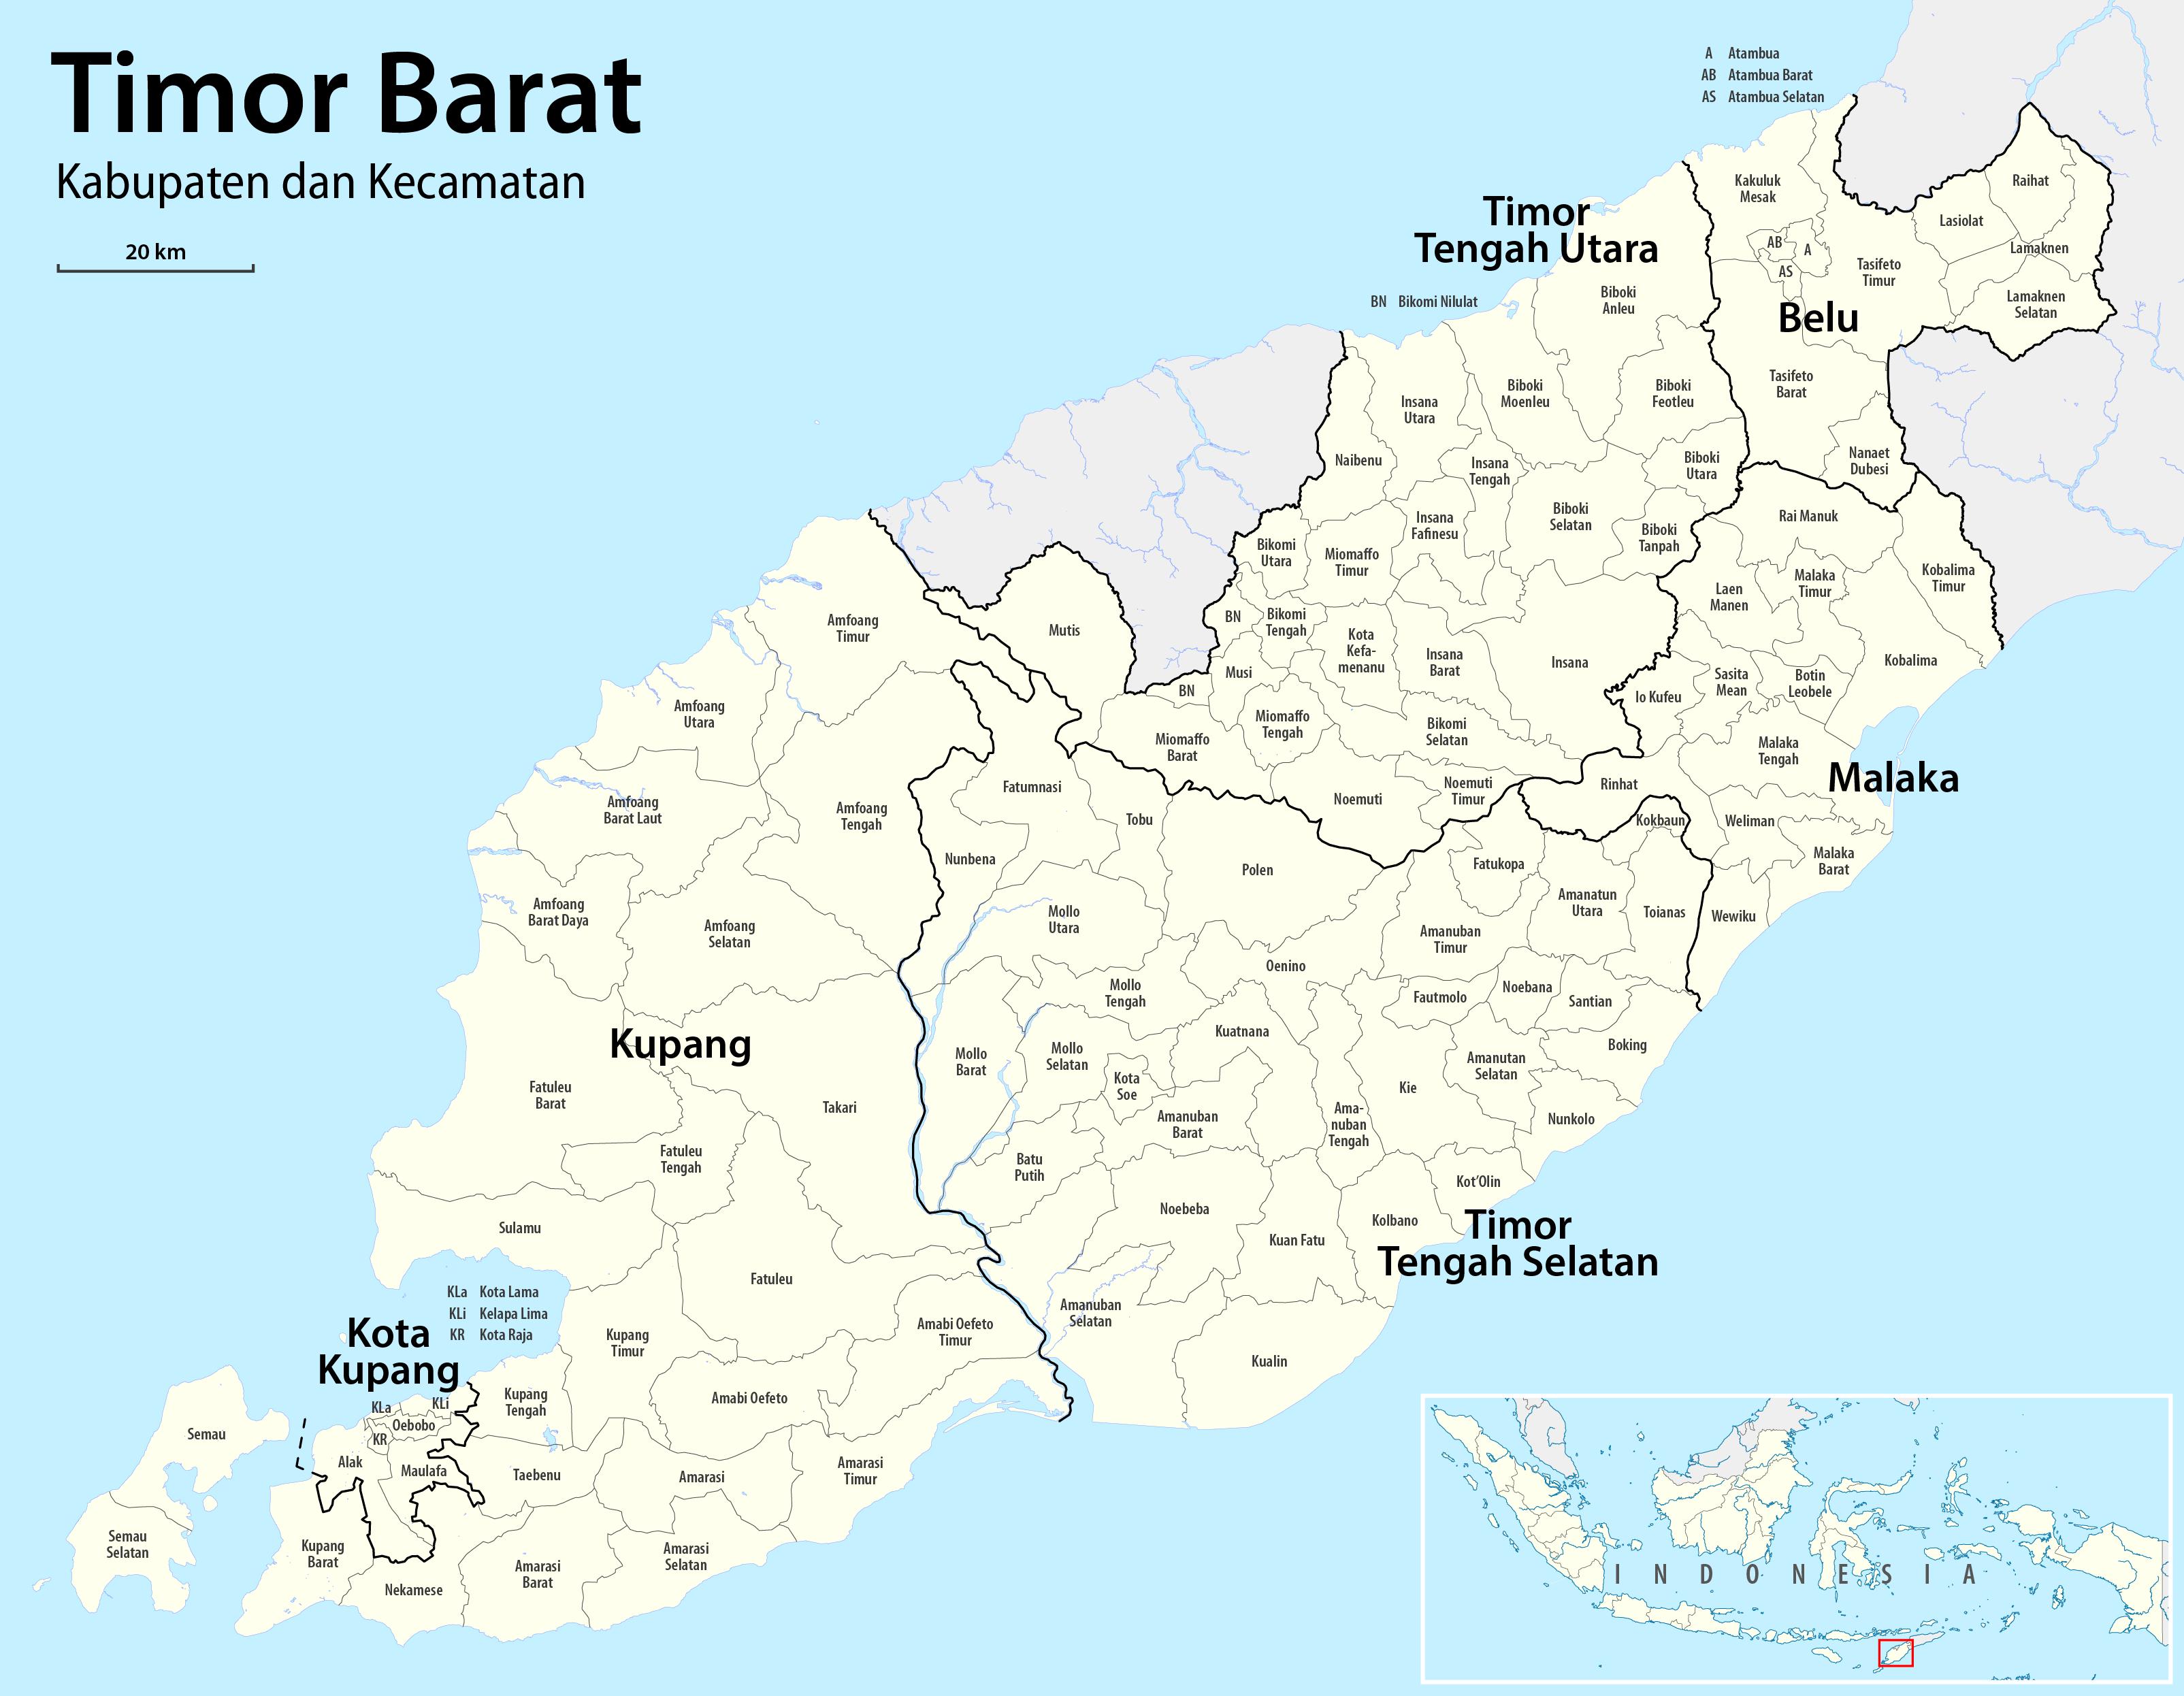 Kota Kupang Wikipedia Bahasa Indonesia Ensiklopedia Bebas Peta Timor Barat